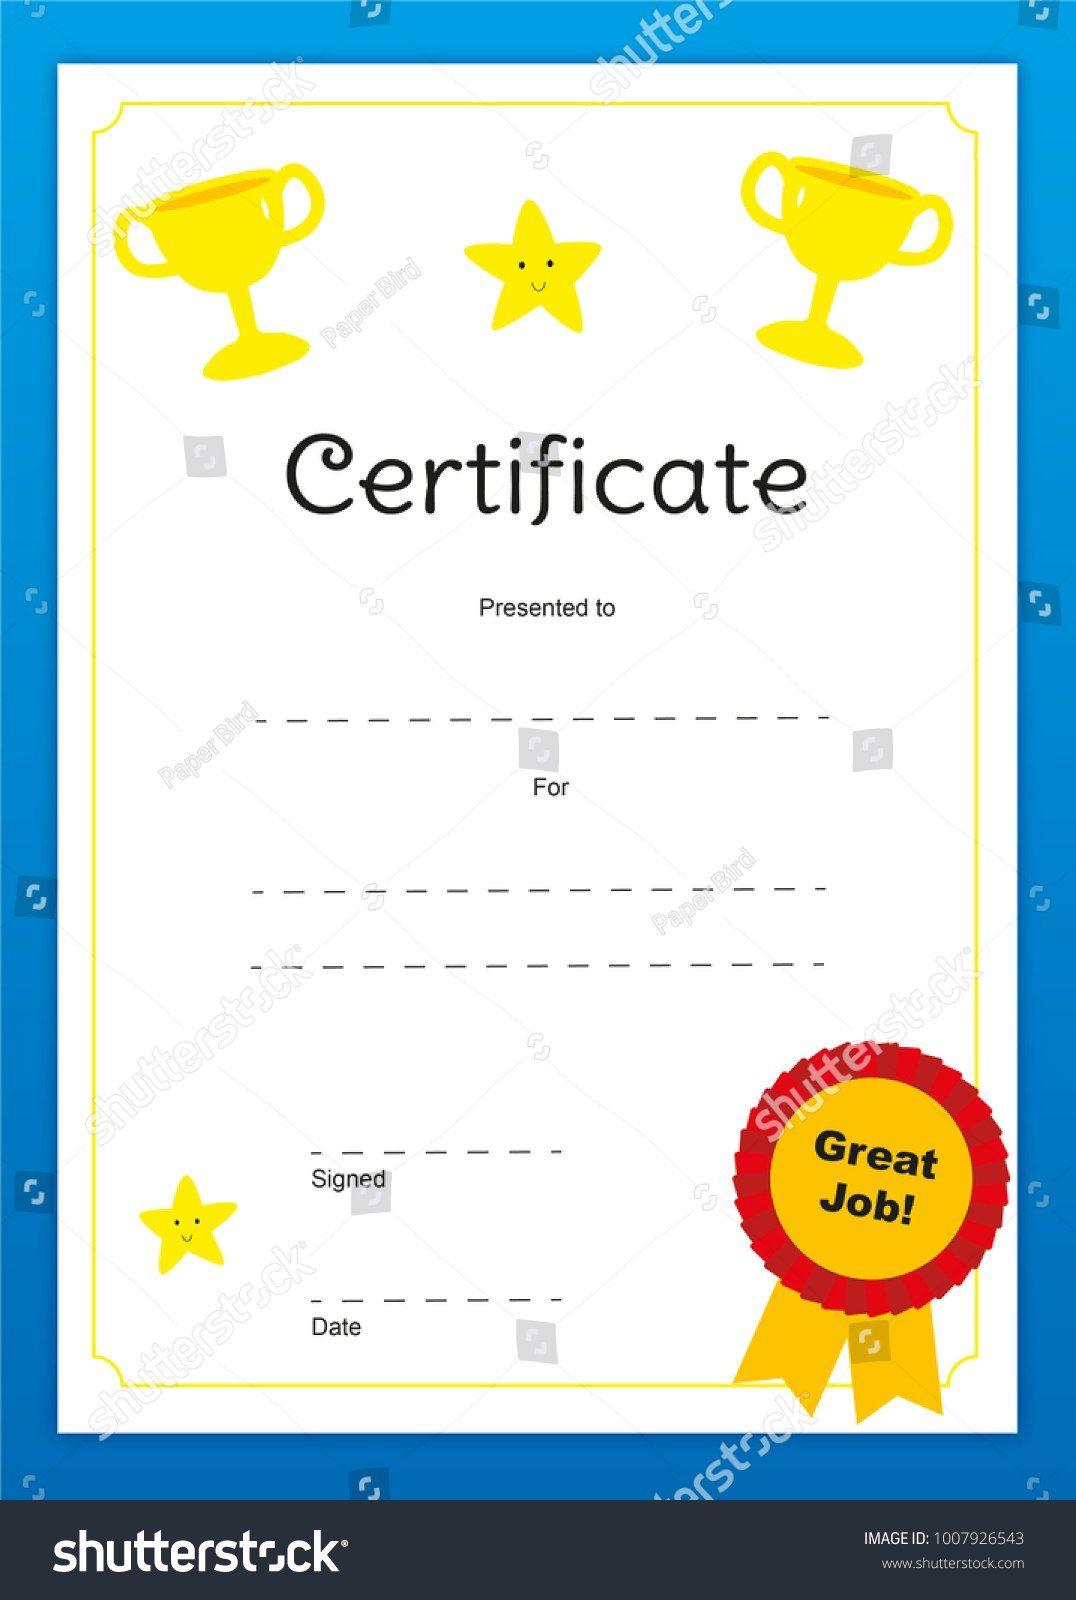 Good Job Certificates Toha for Good Job Certificate